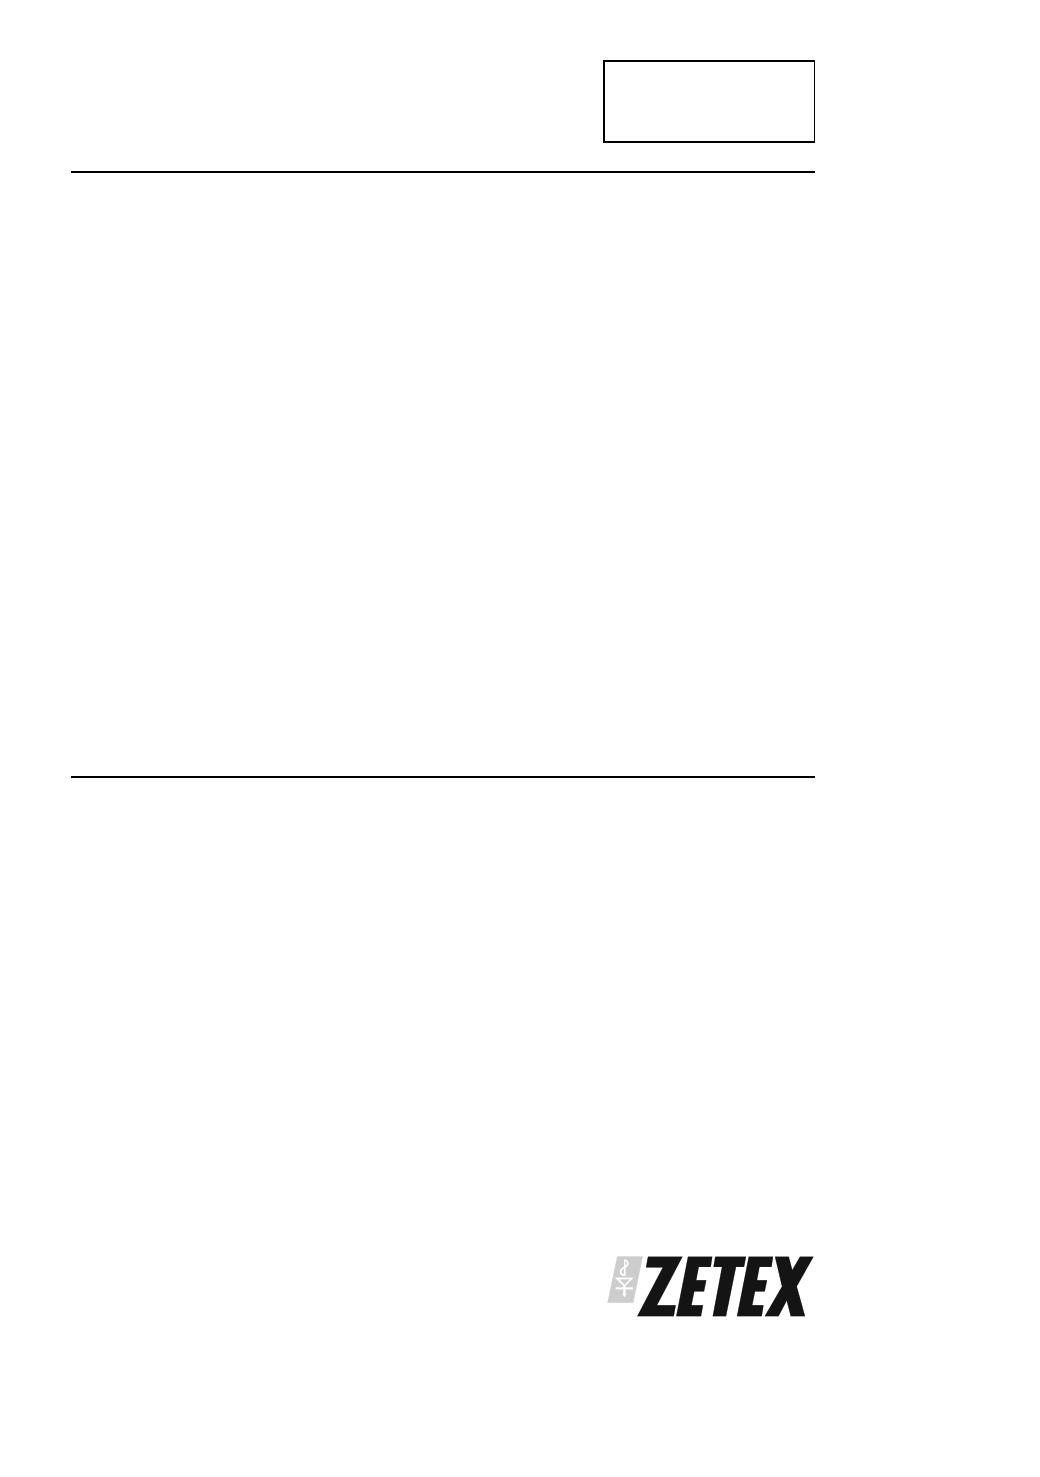 ZNBR4001Q16 دیتاشیت PDF